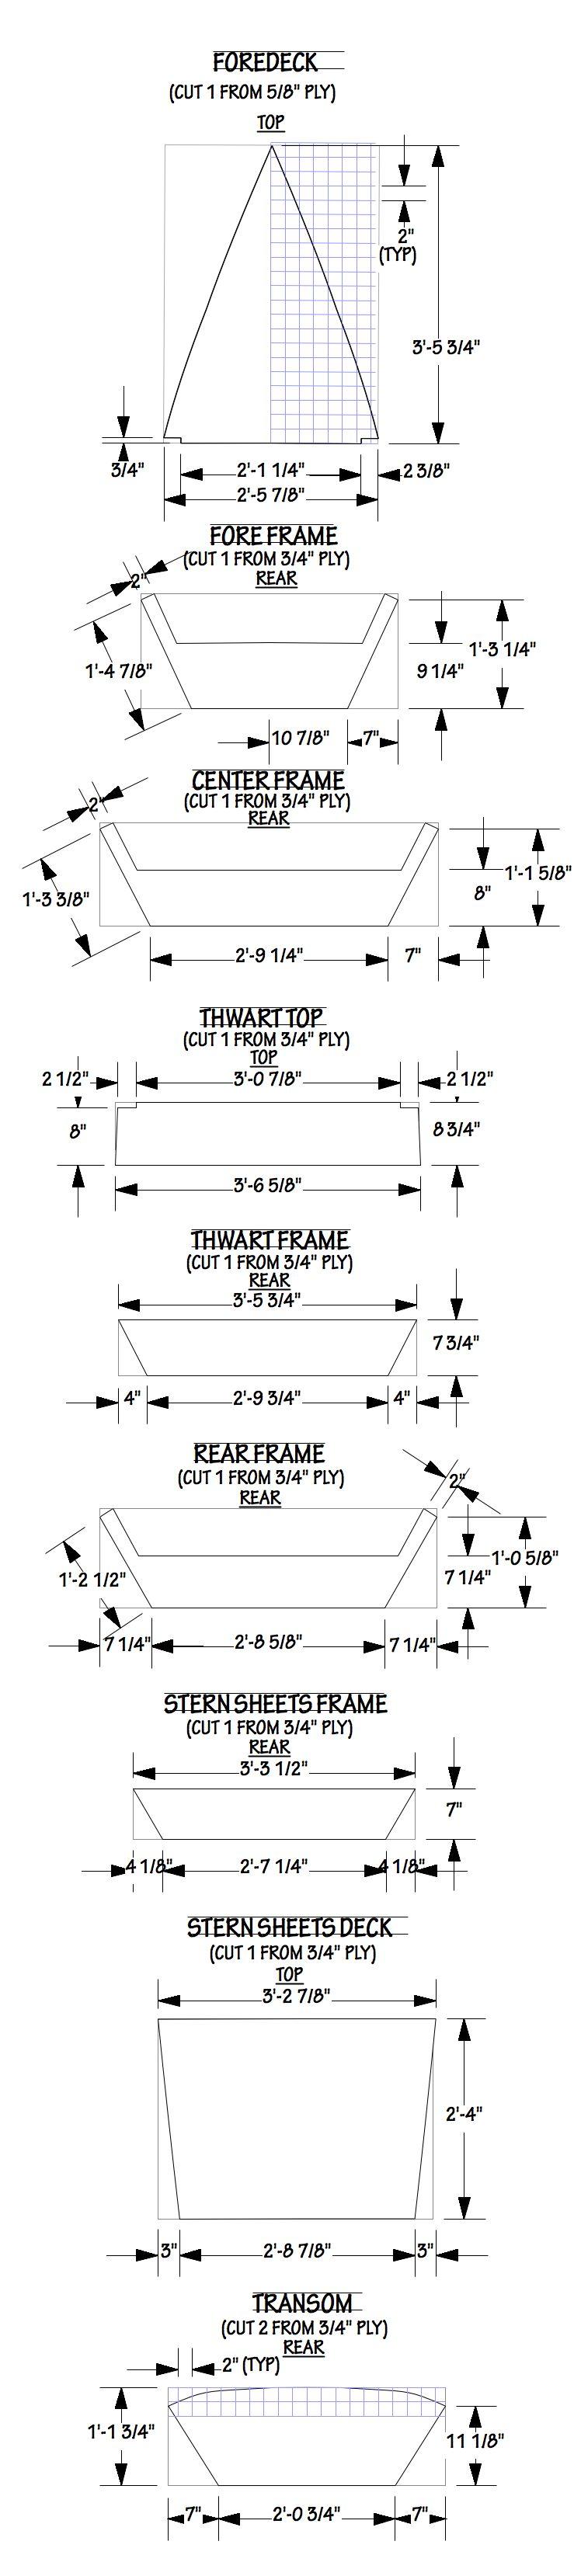 Uncategorized well pump house covers austin locking sump lid -  Templatecarouselboatthwarts Decks